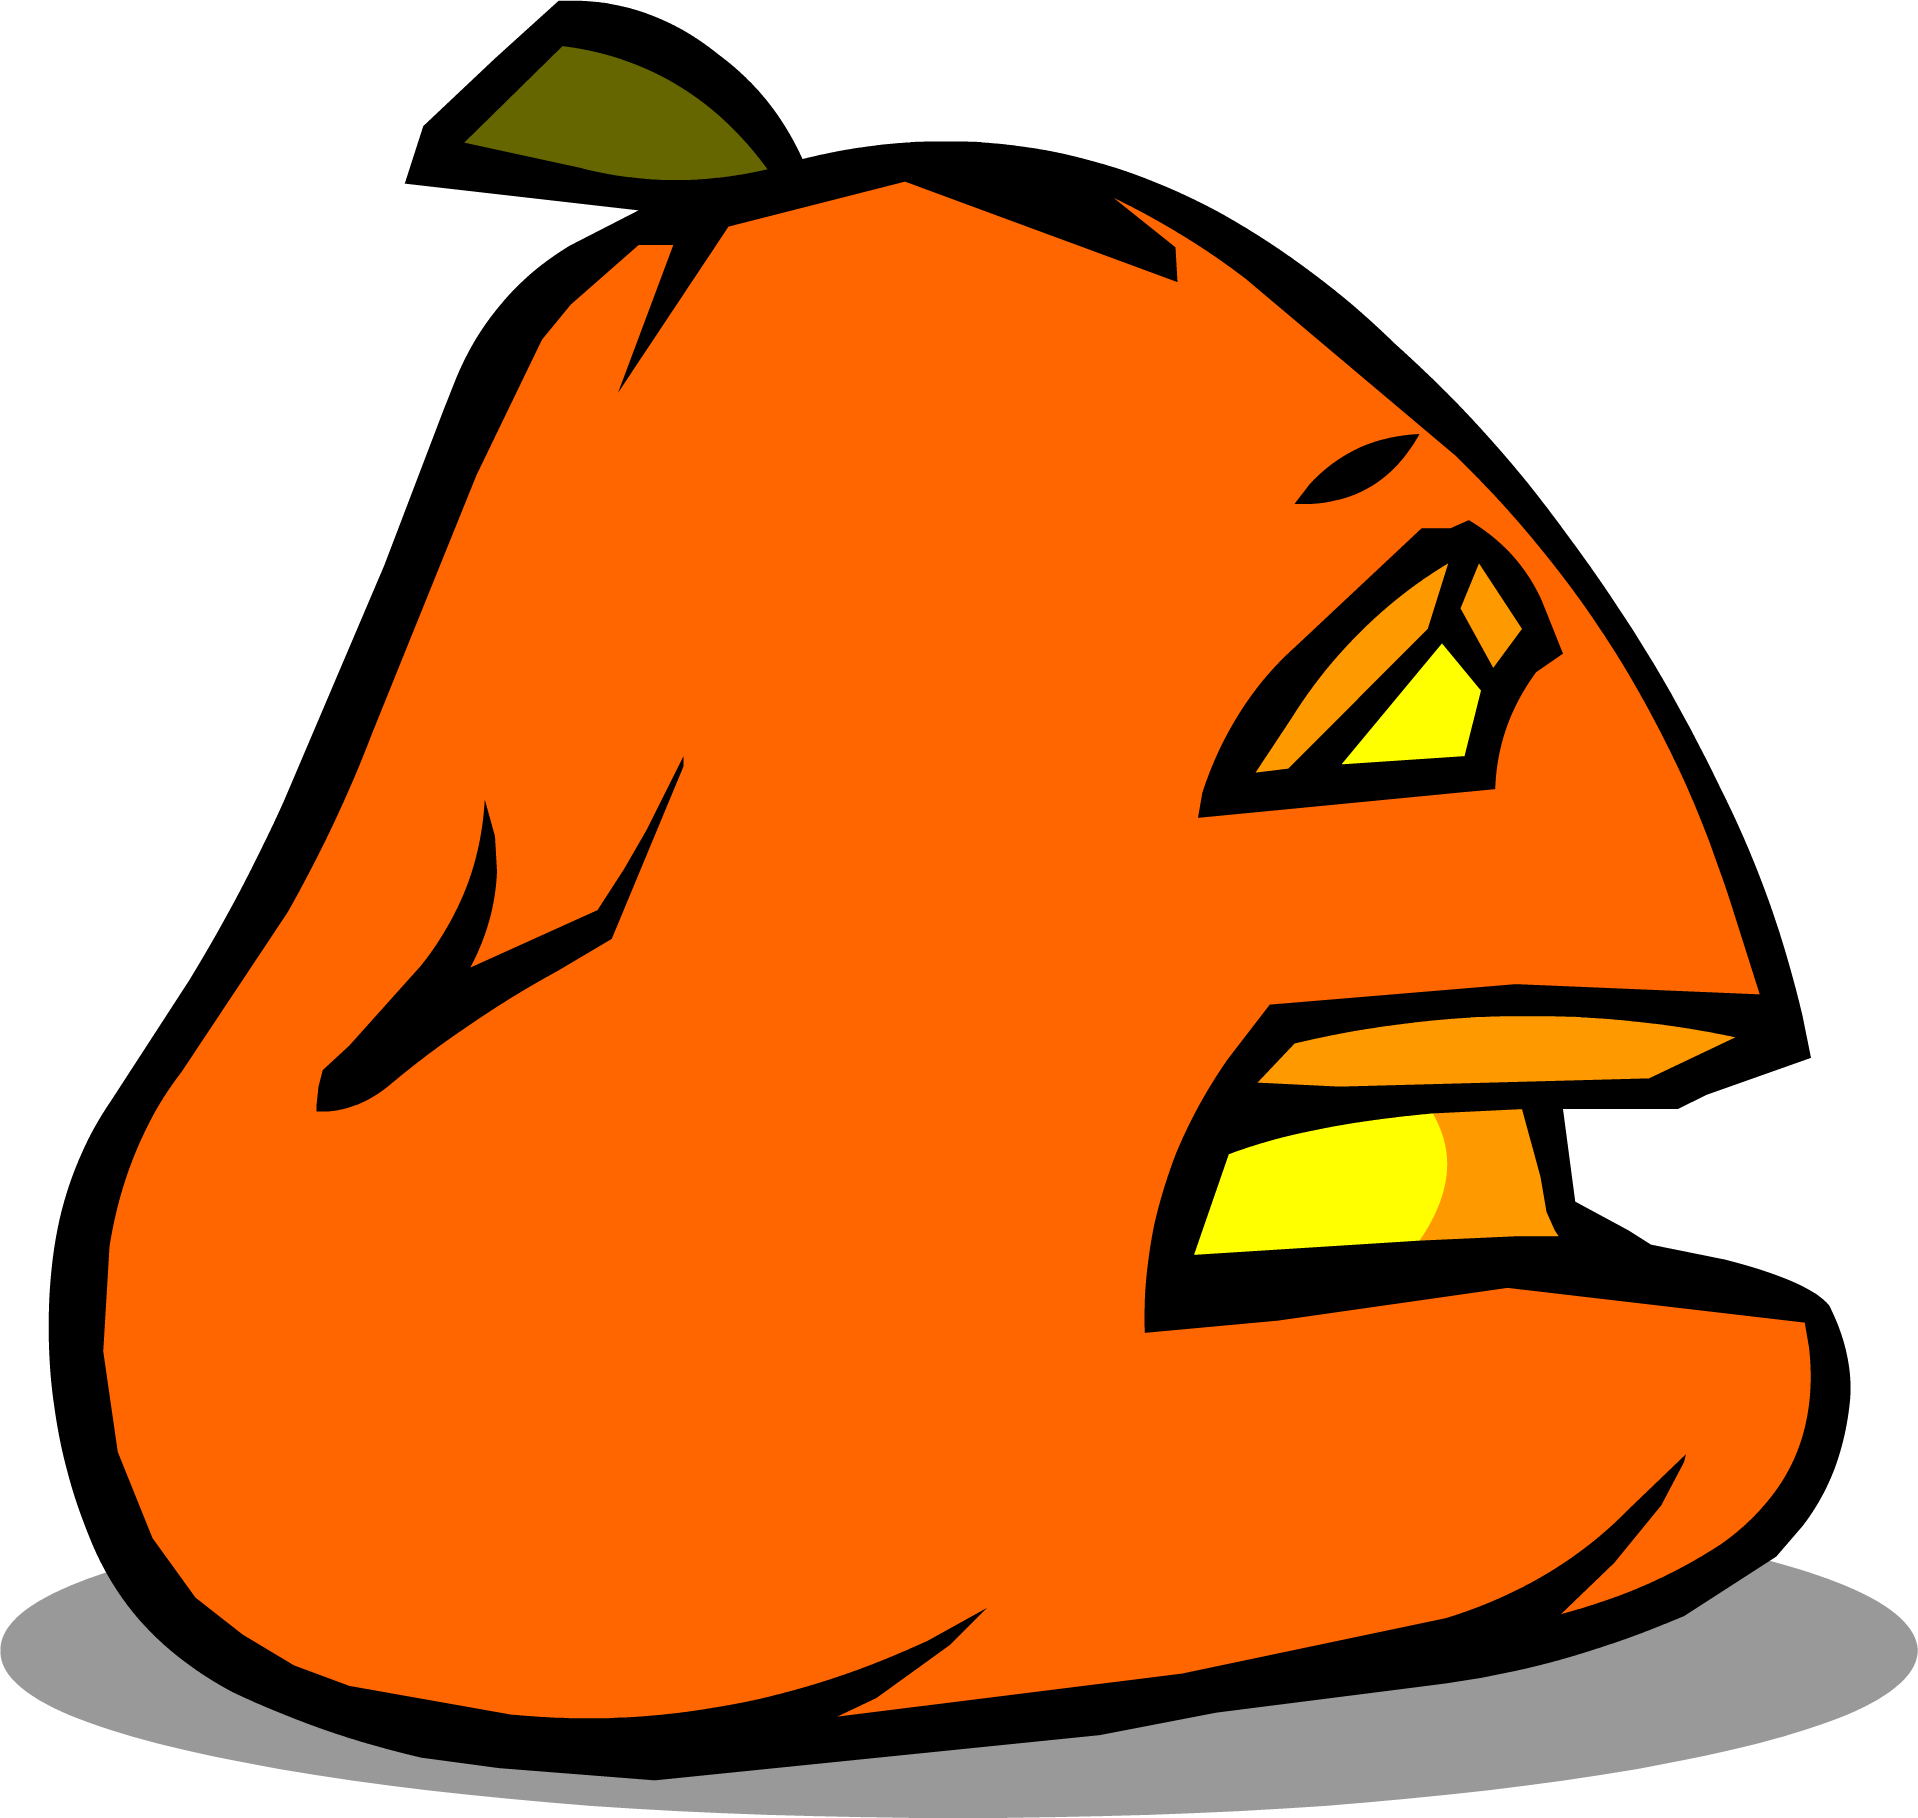 Pumpkin clipart jack o lantern sprite clip art black and white download Image - Sad Jack-O-Lantern sprite 006.png | Club Penguin Rewritten ... clip art black and white download